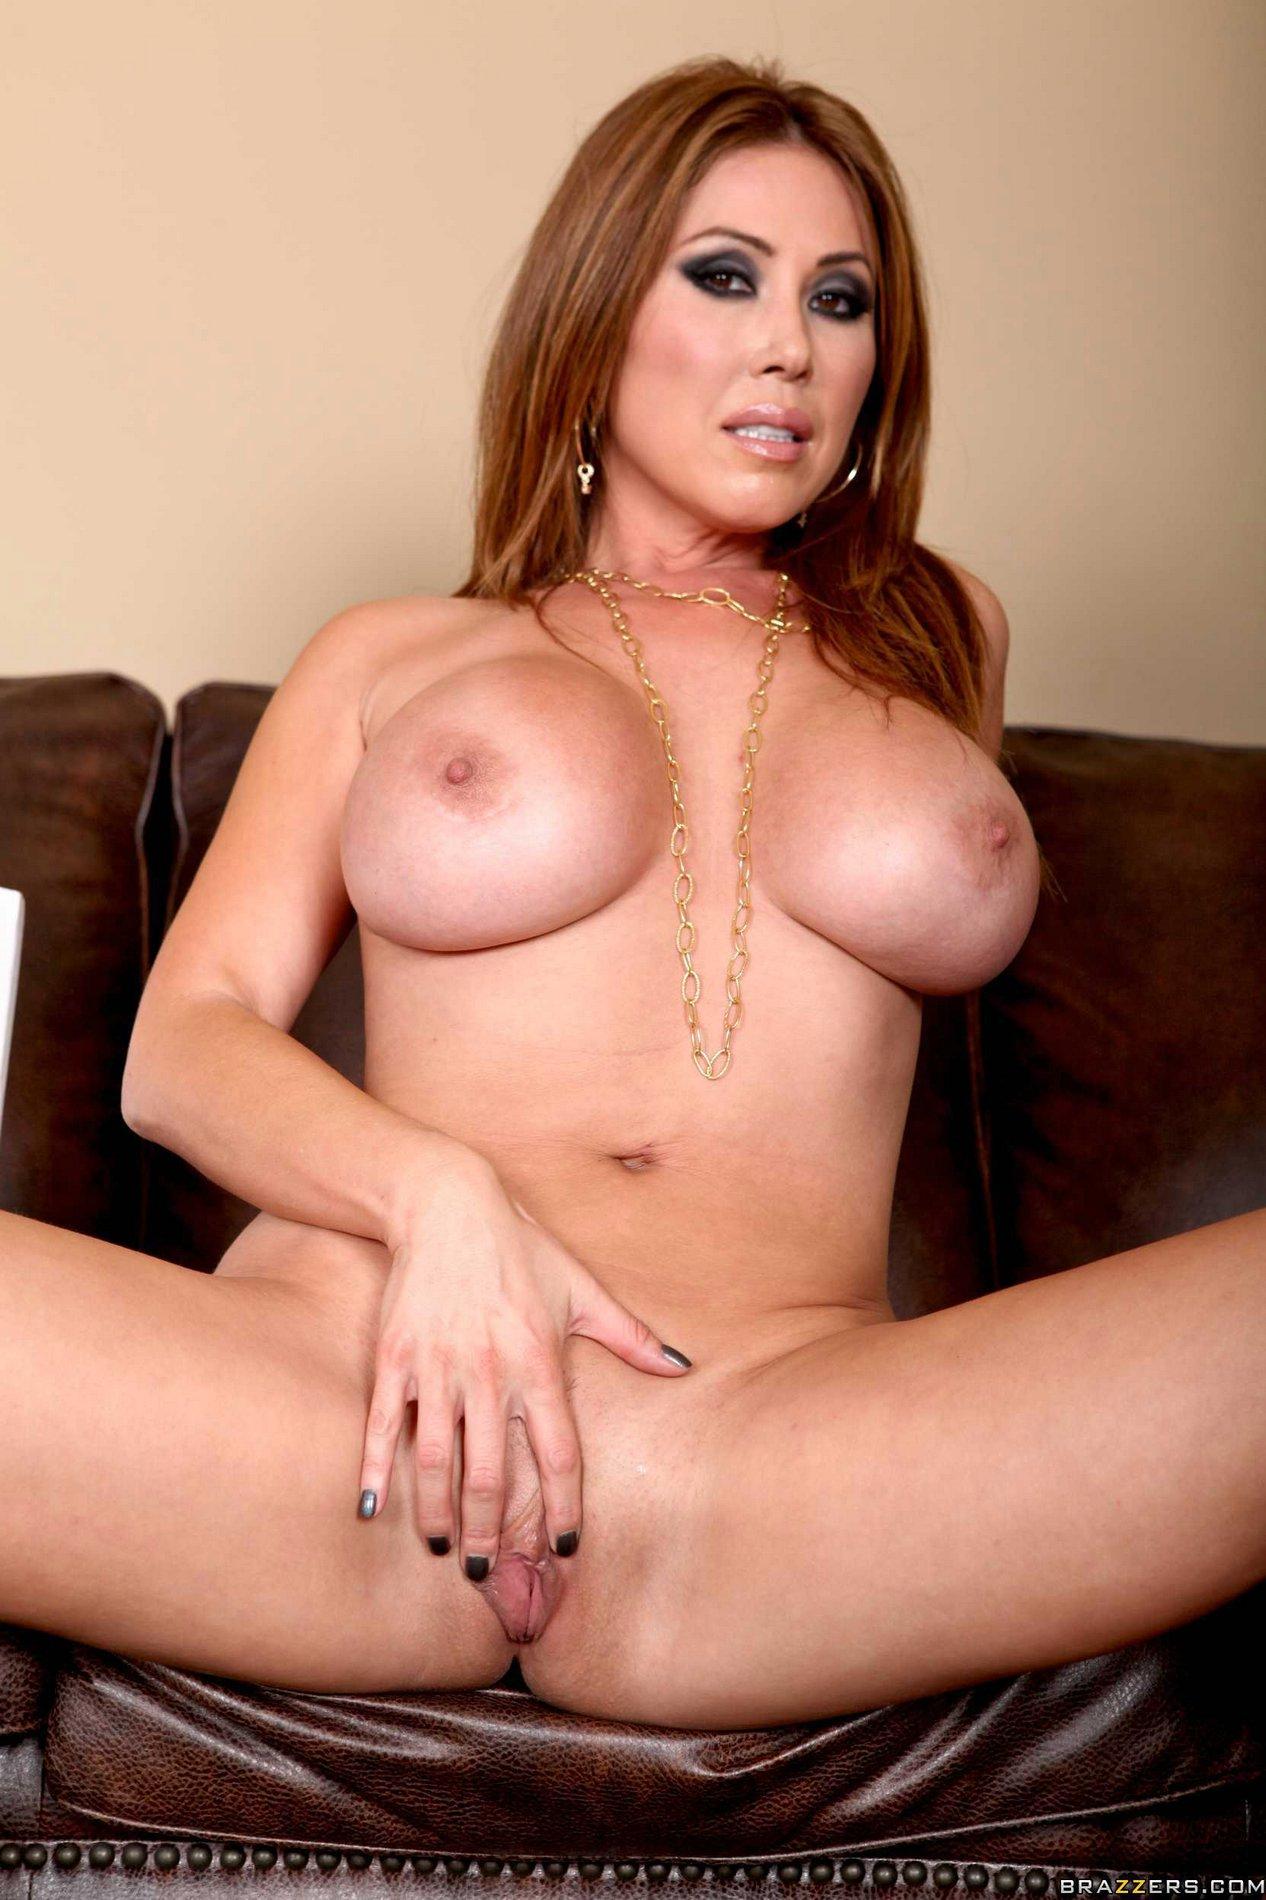 Voluptuous asian milf kianna dior shows off her gigantic tits in leopard print lingerie